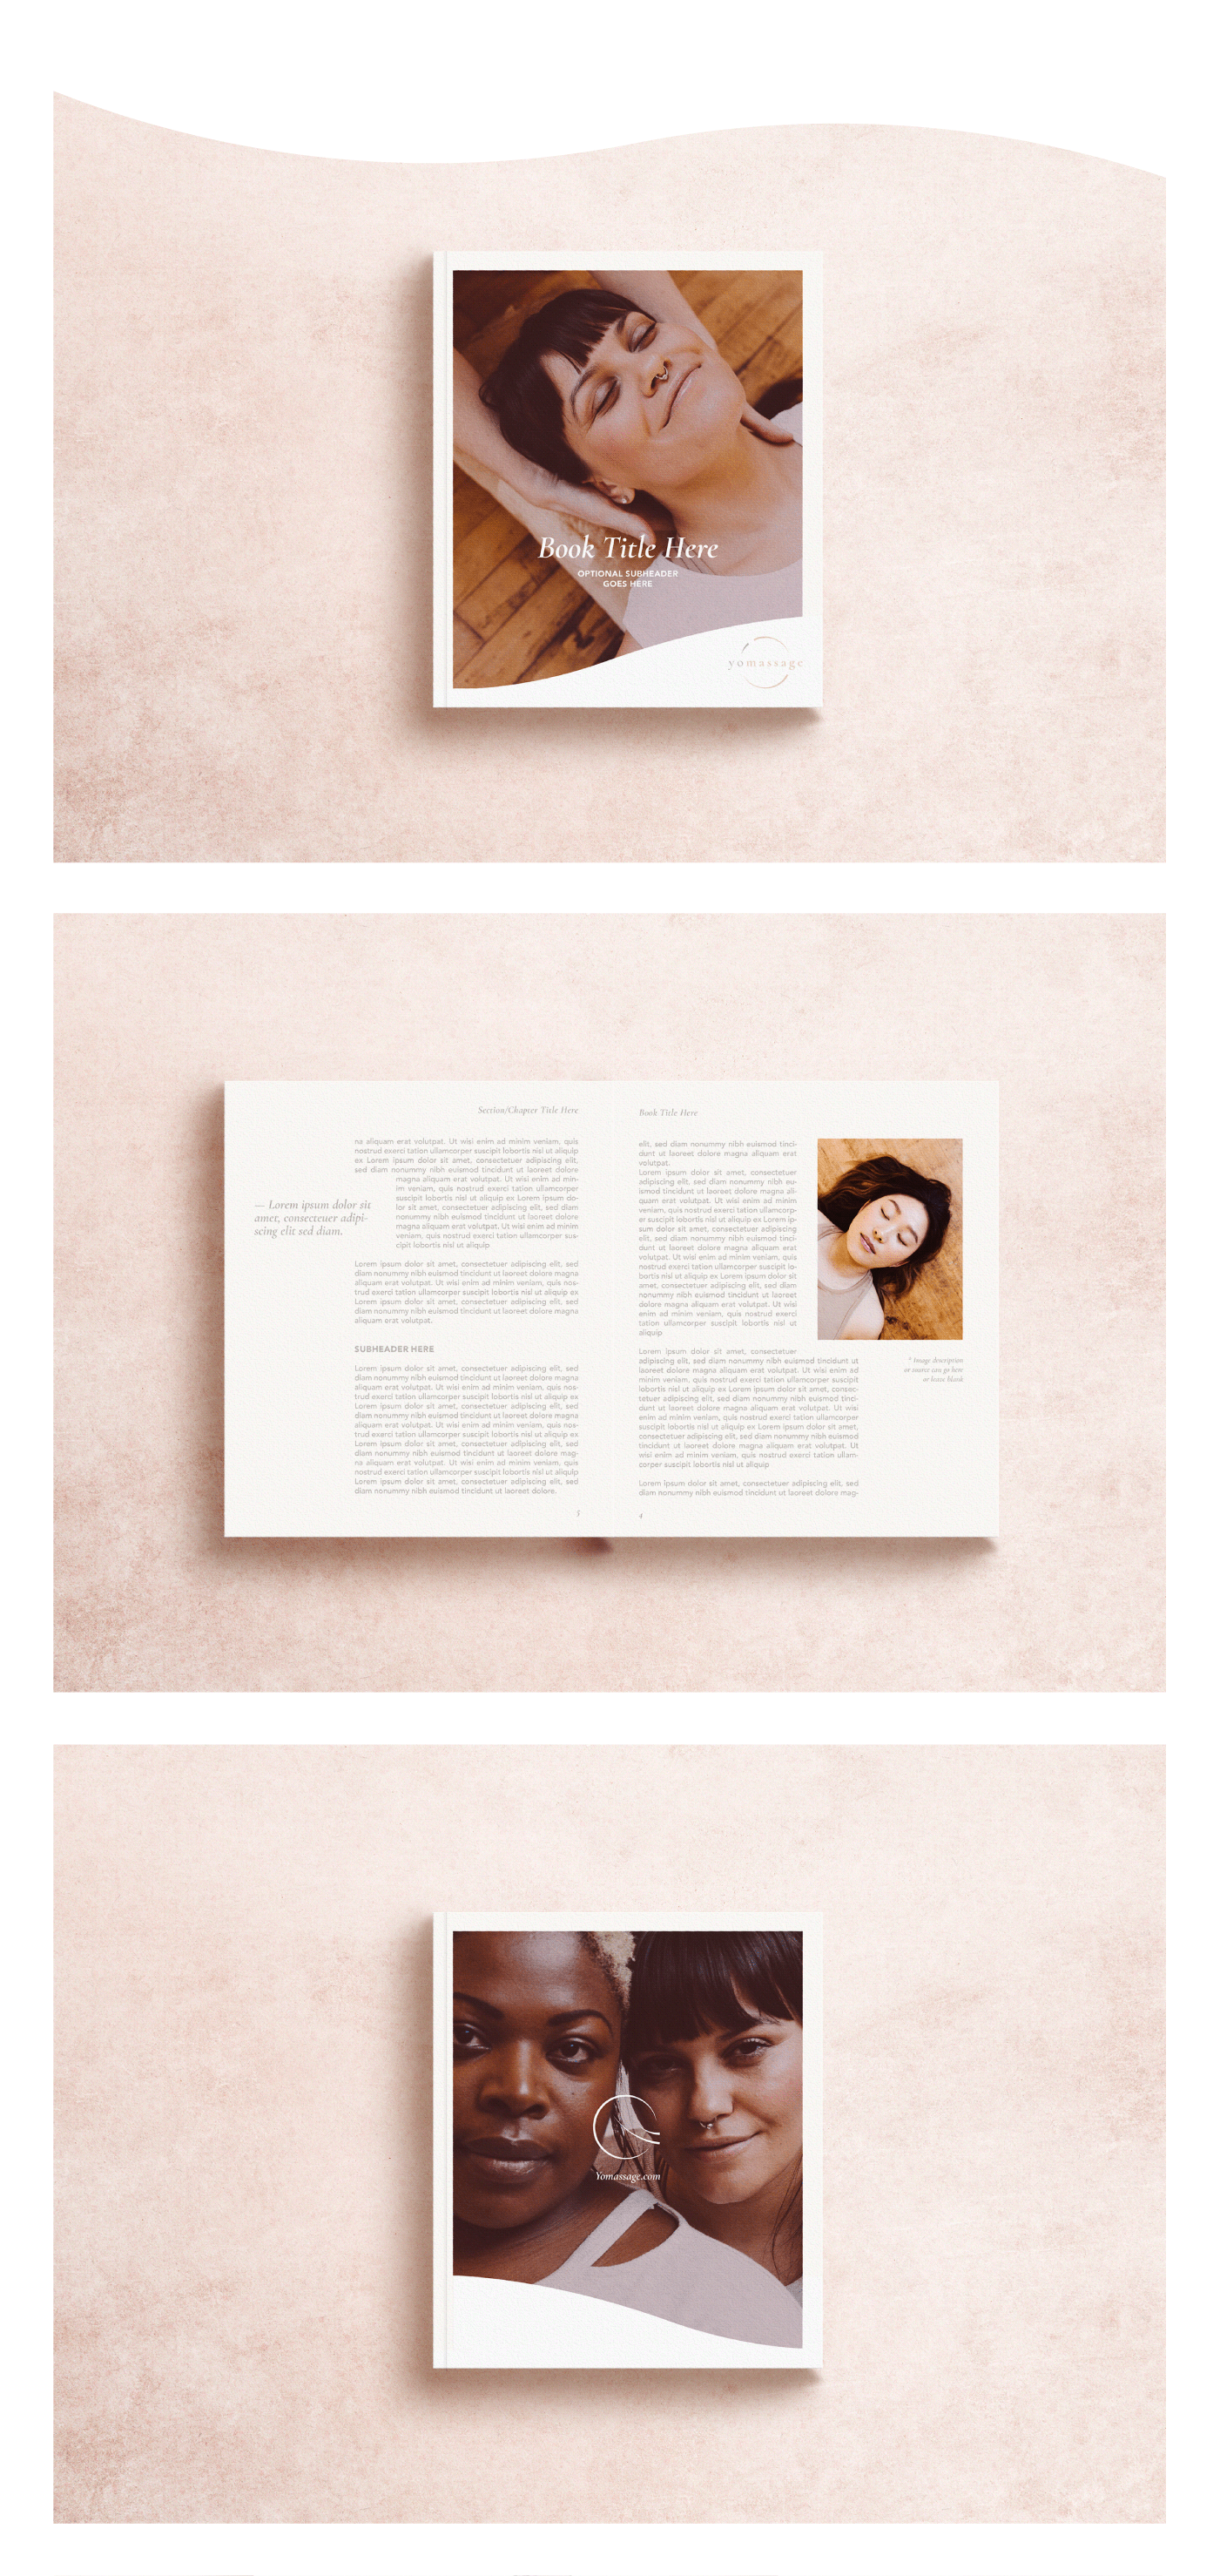 Yomassage book design by Wink Digital // Michelle Parent